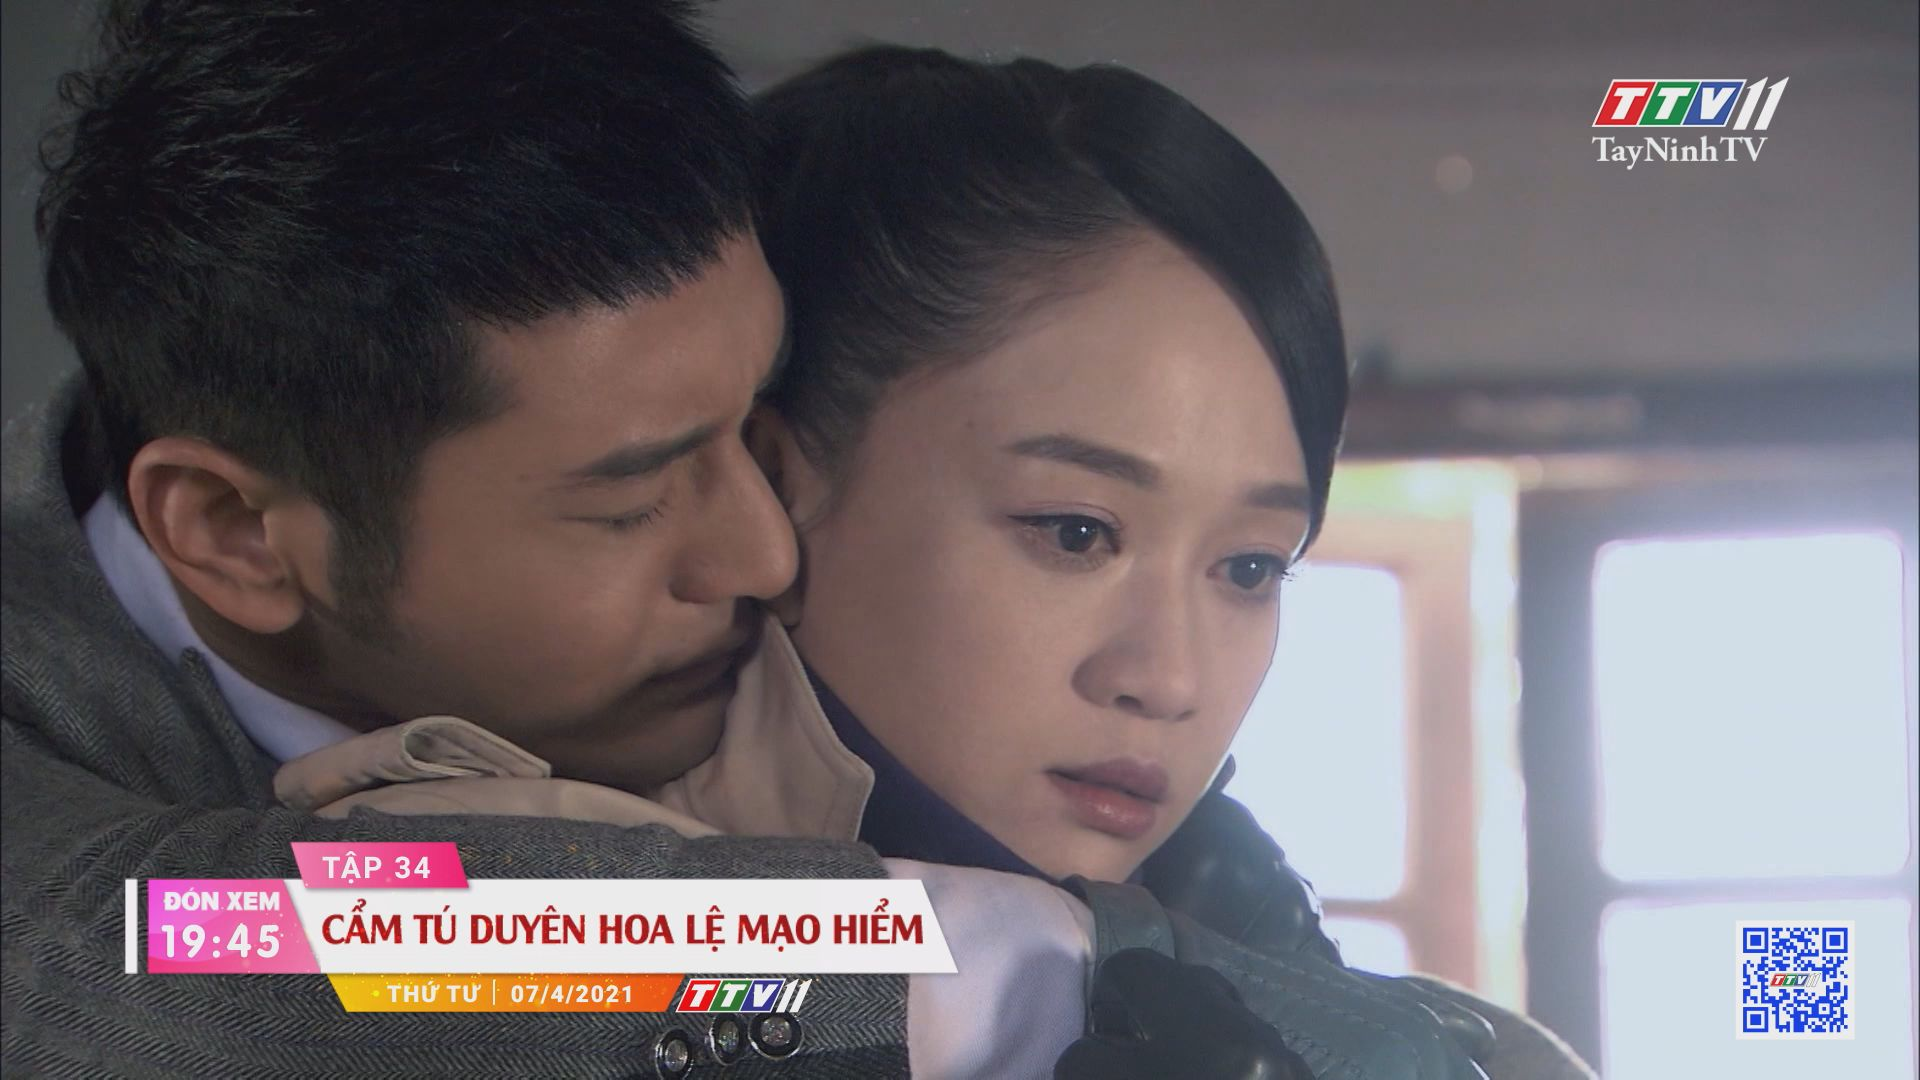 Cẩm Tú duyên hoa lệ mạo hiểm-Trailer tập 34 | PHIM CẨM TÚ DUYÊN HOA LỆ MẠO HIỂM | TayNinhTVE